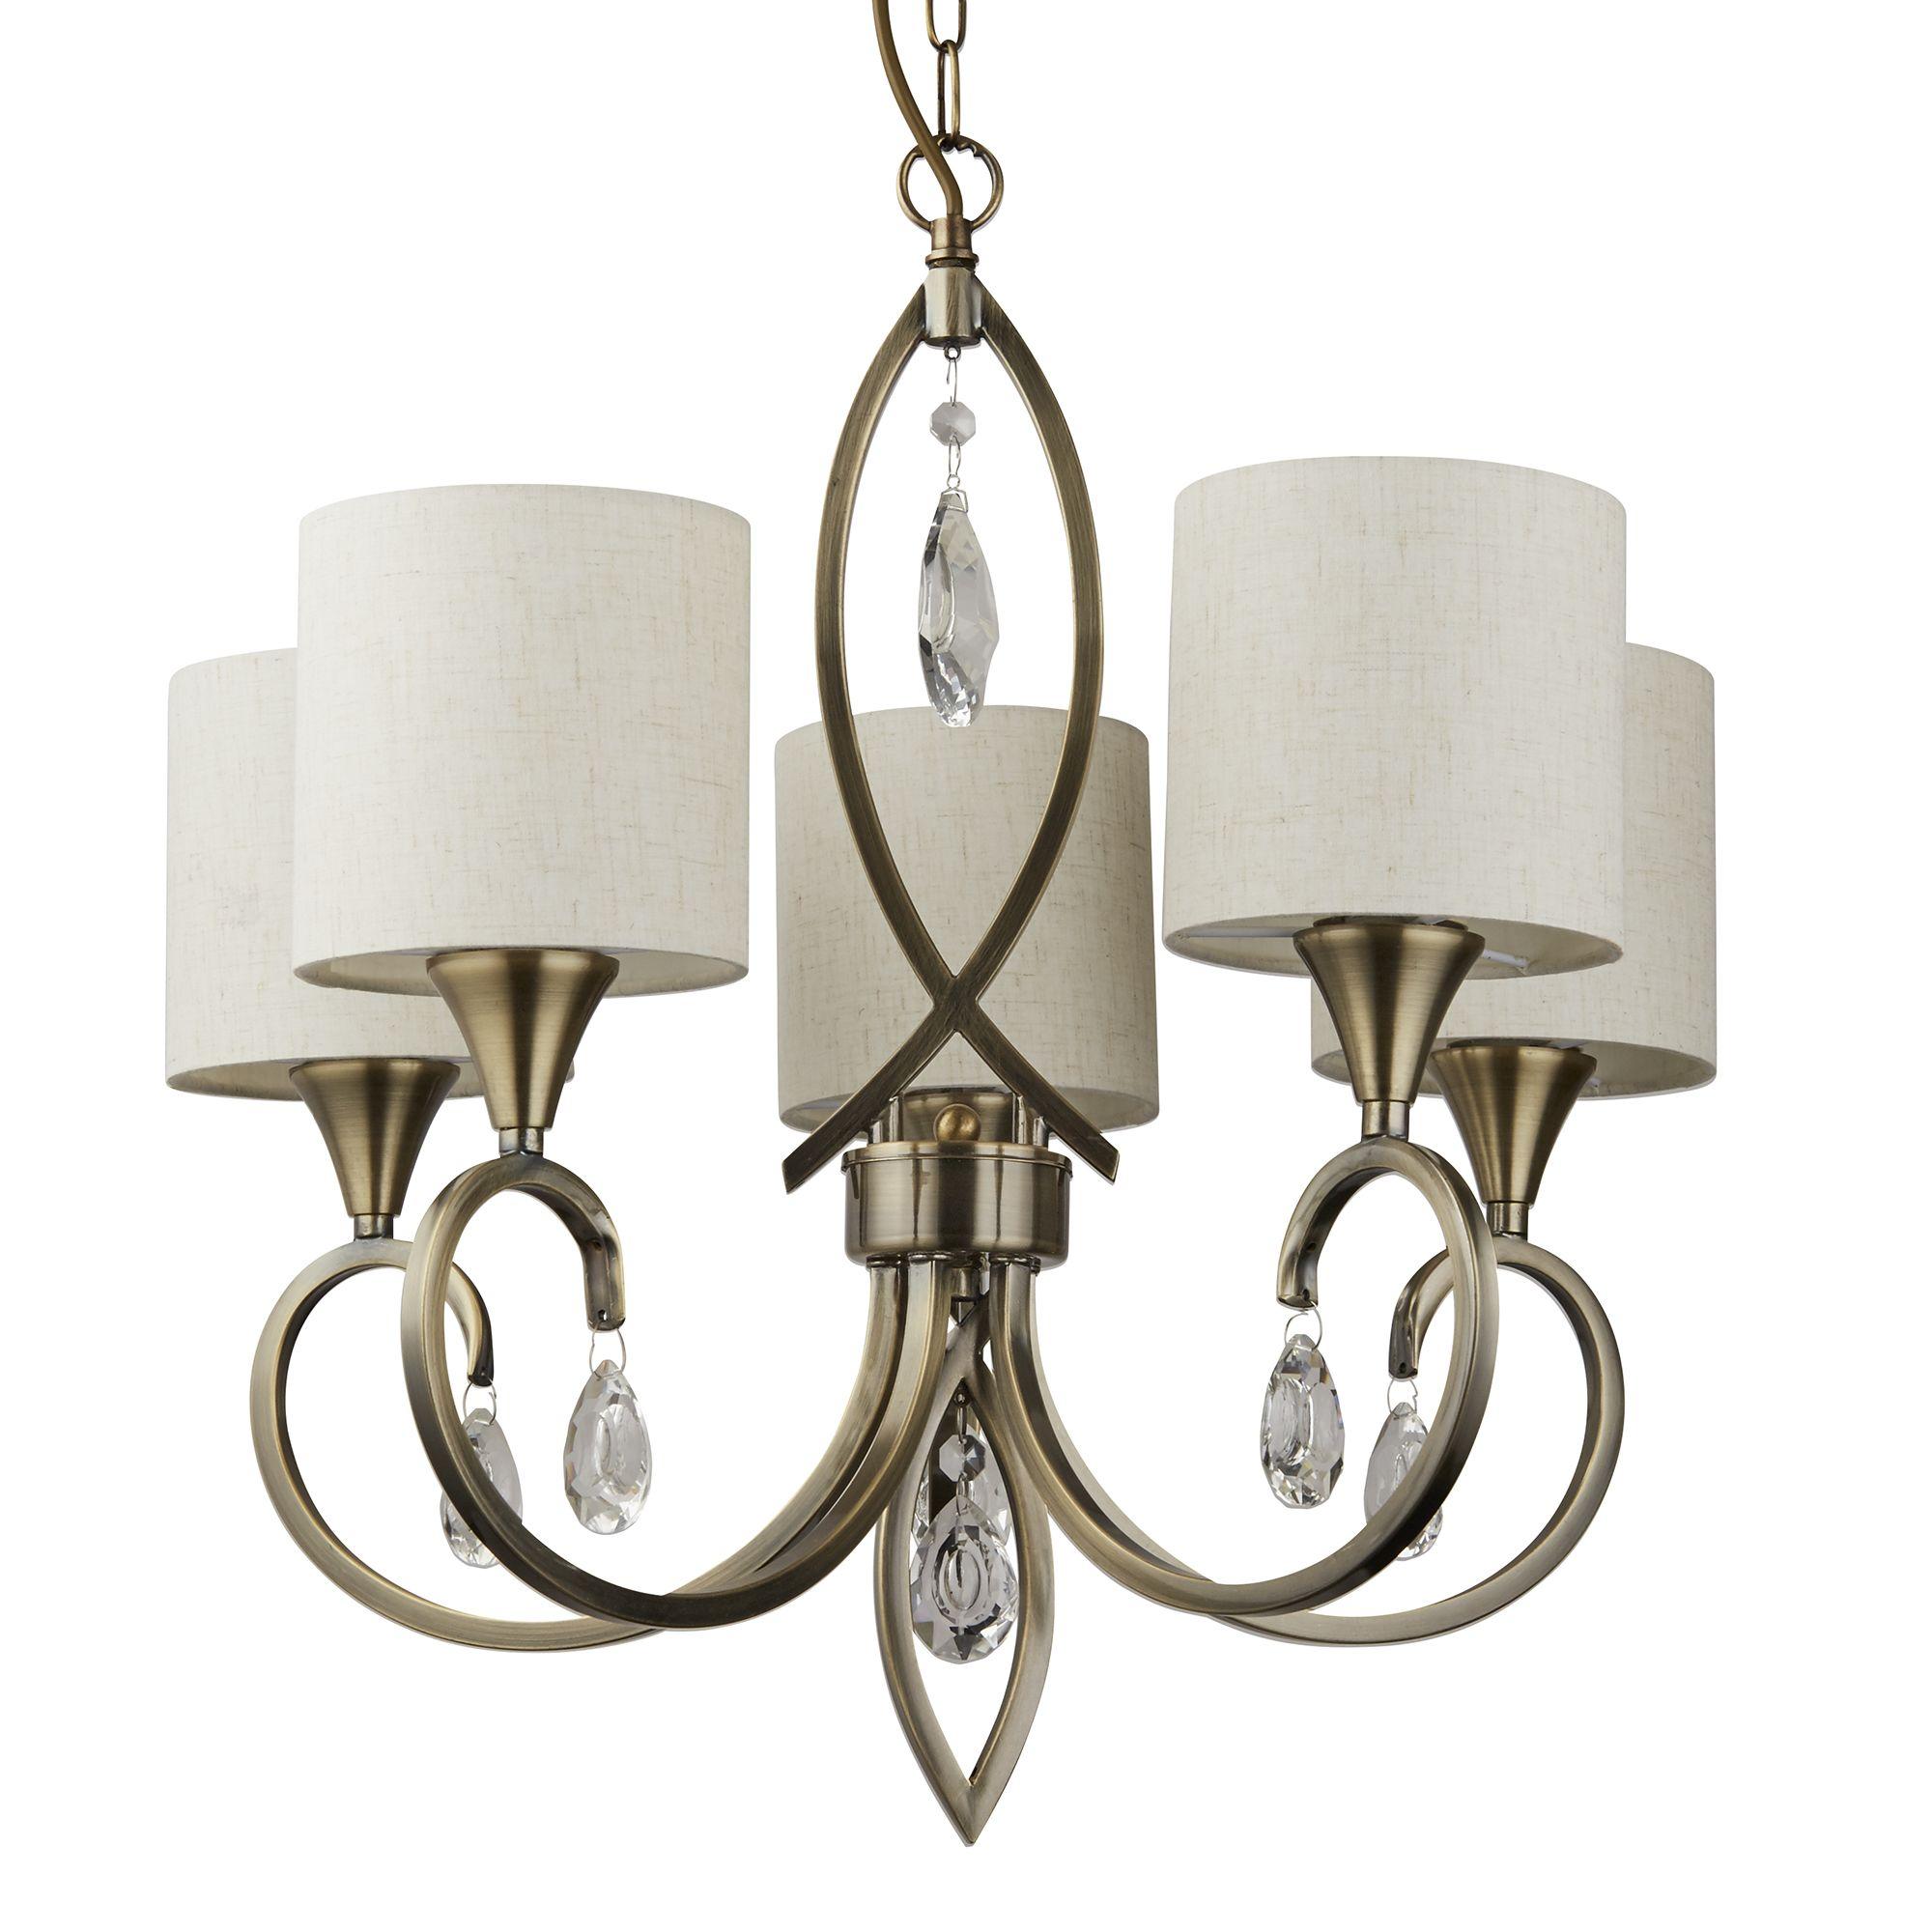 Awe Inspiring Alberto 5 Light Pendant Antique Brass Clear Crystal Drops Interior Design Ideas Tzicisoteloinfo